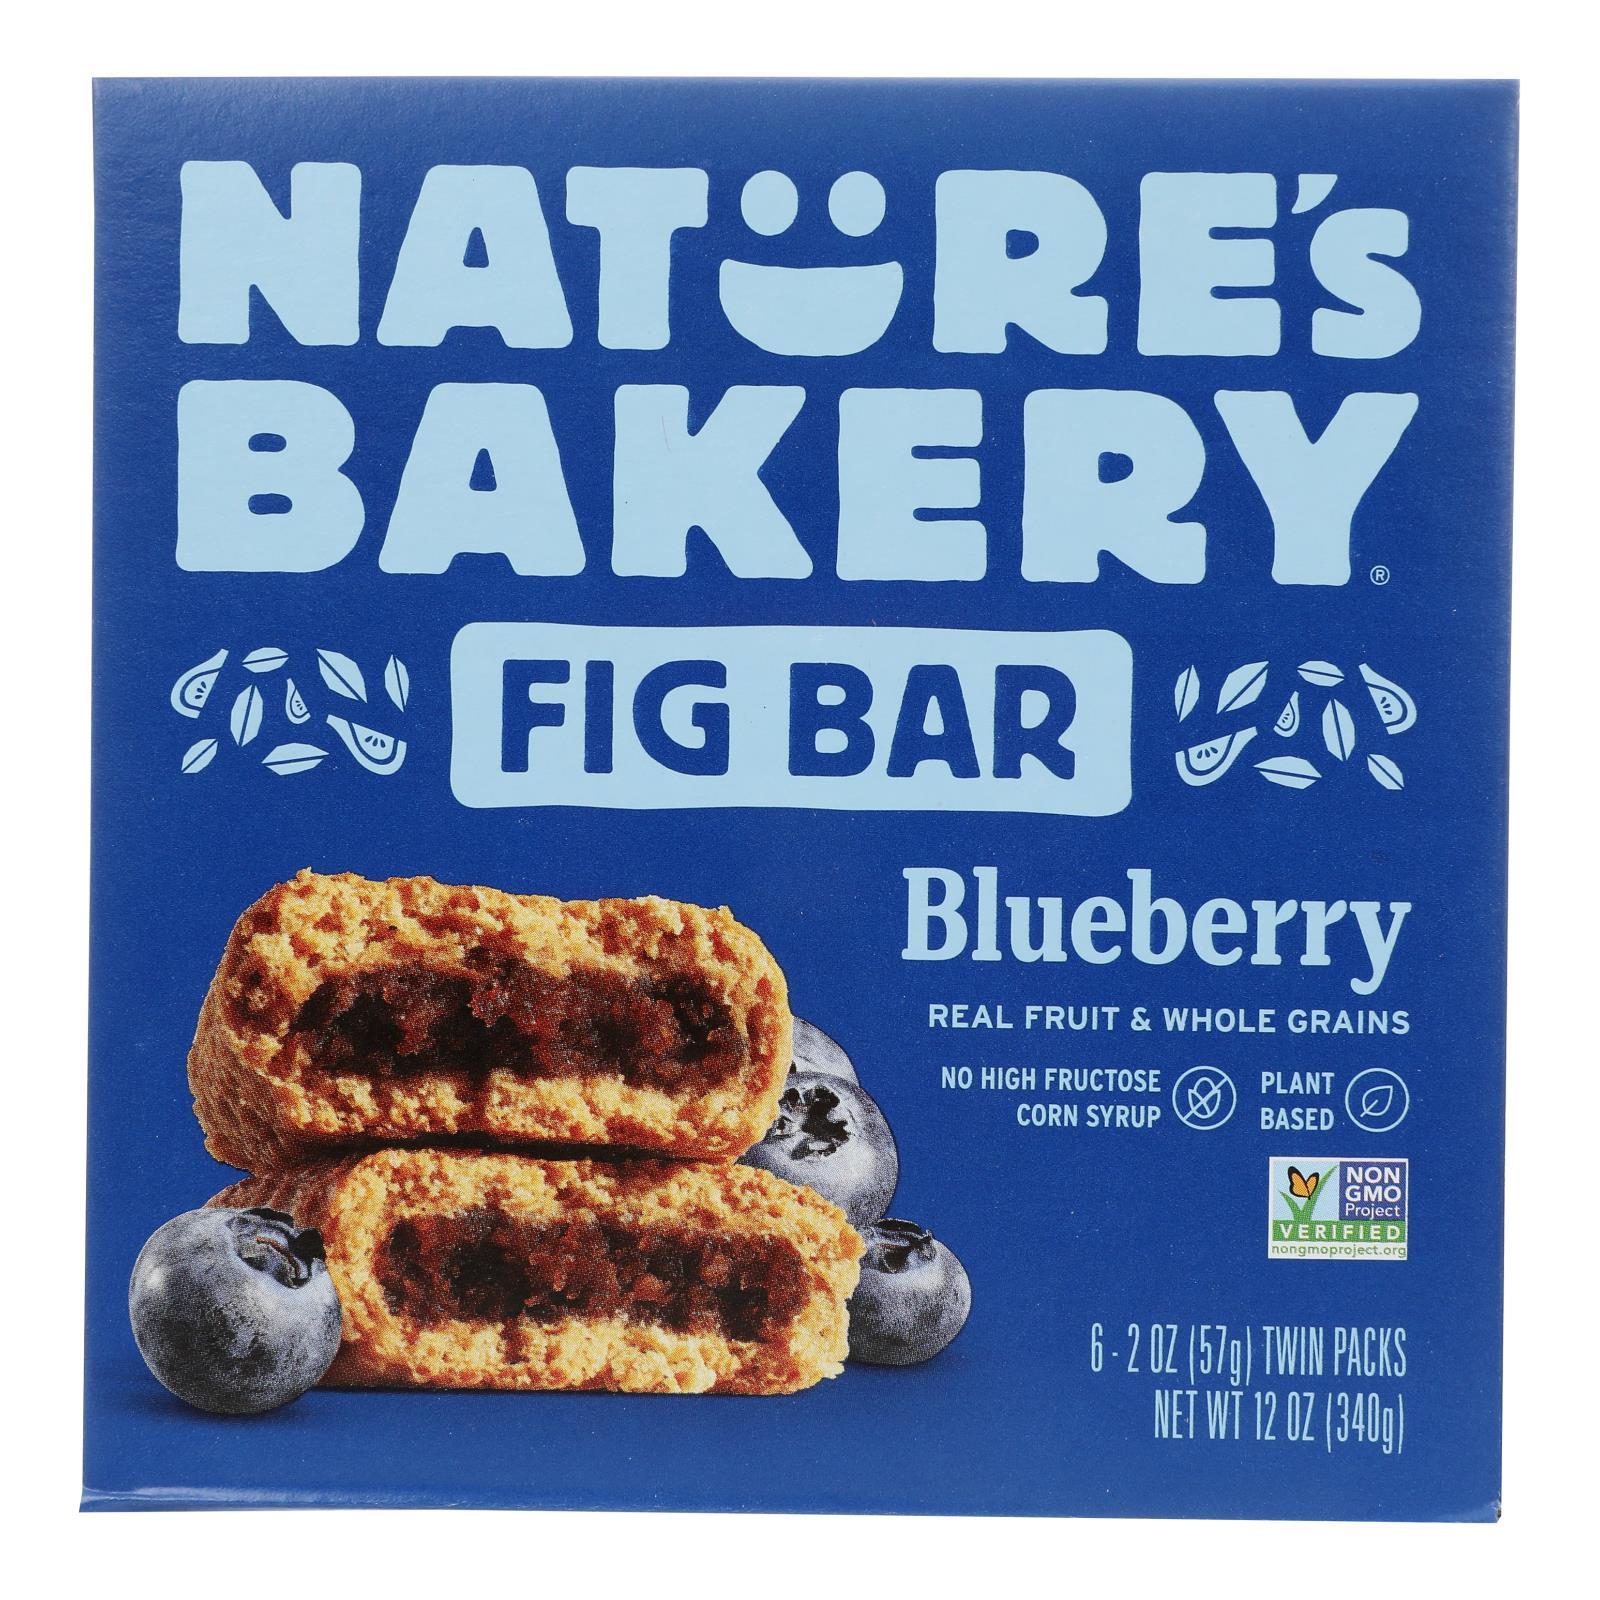 Nature's Bakery Stone Ground Whole Wheat Fig Bar - Blueberry - Case of 6 - 2 oz.